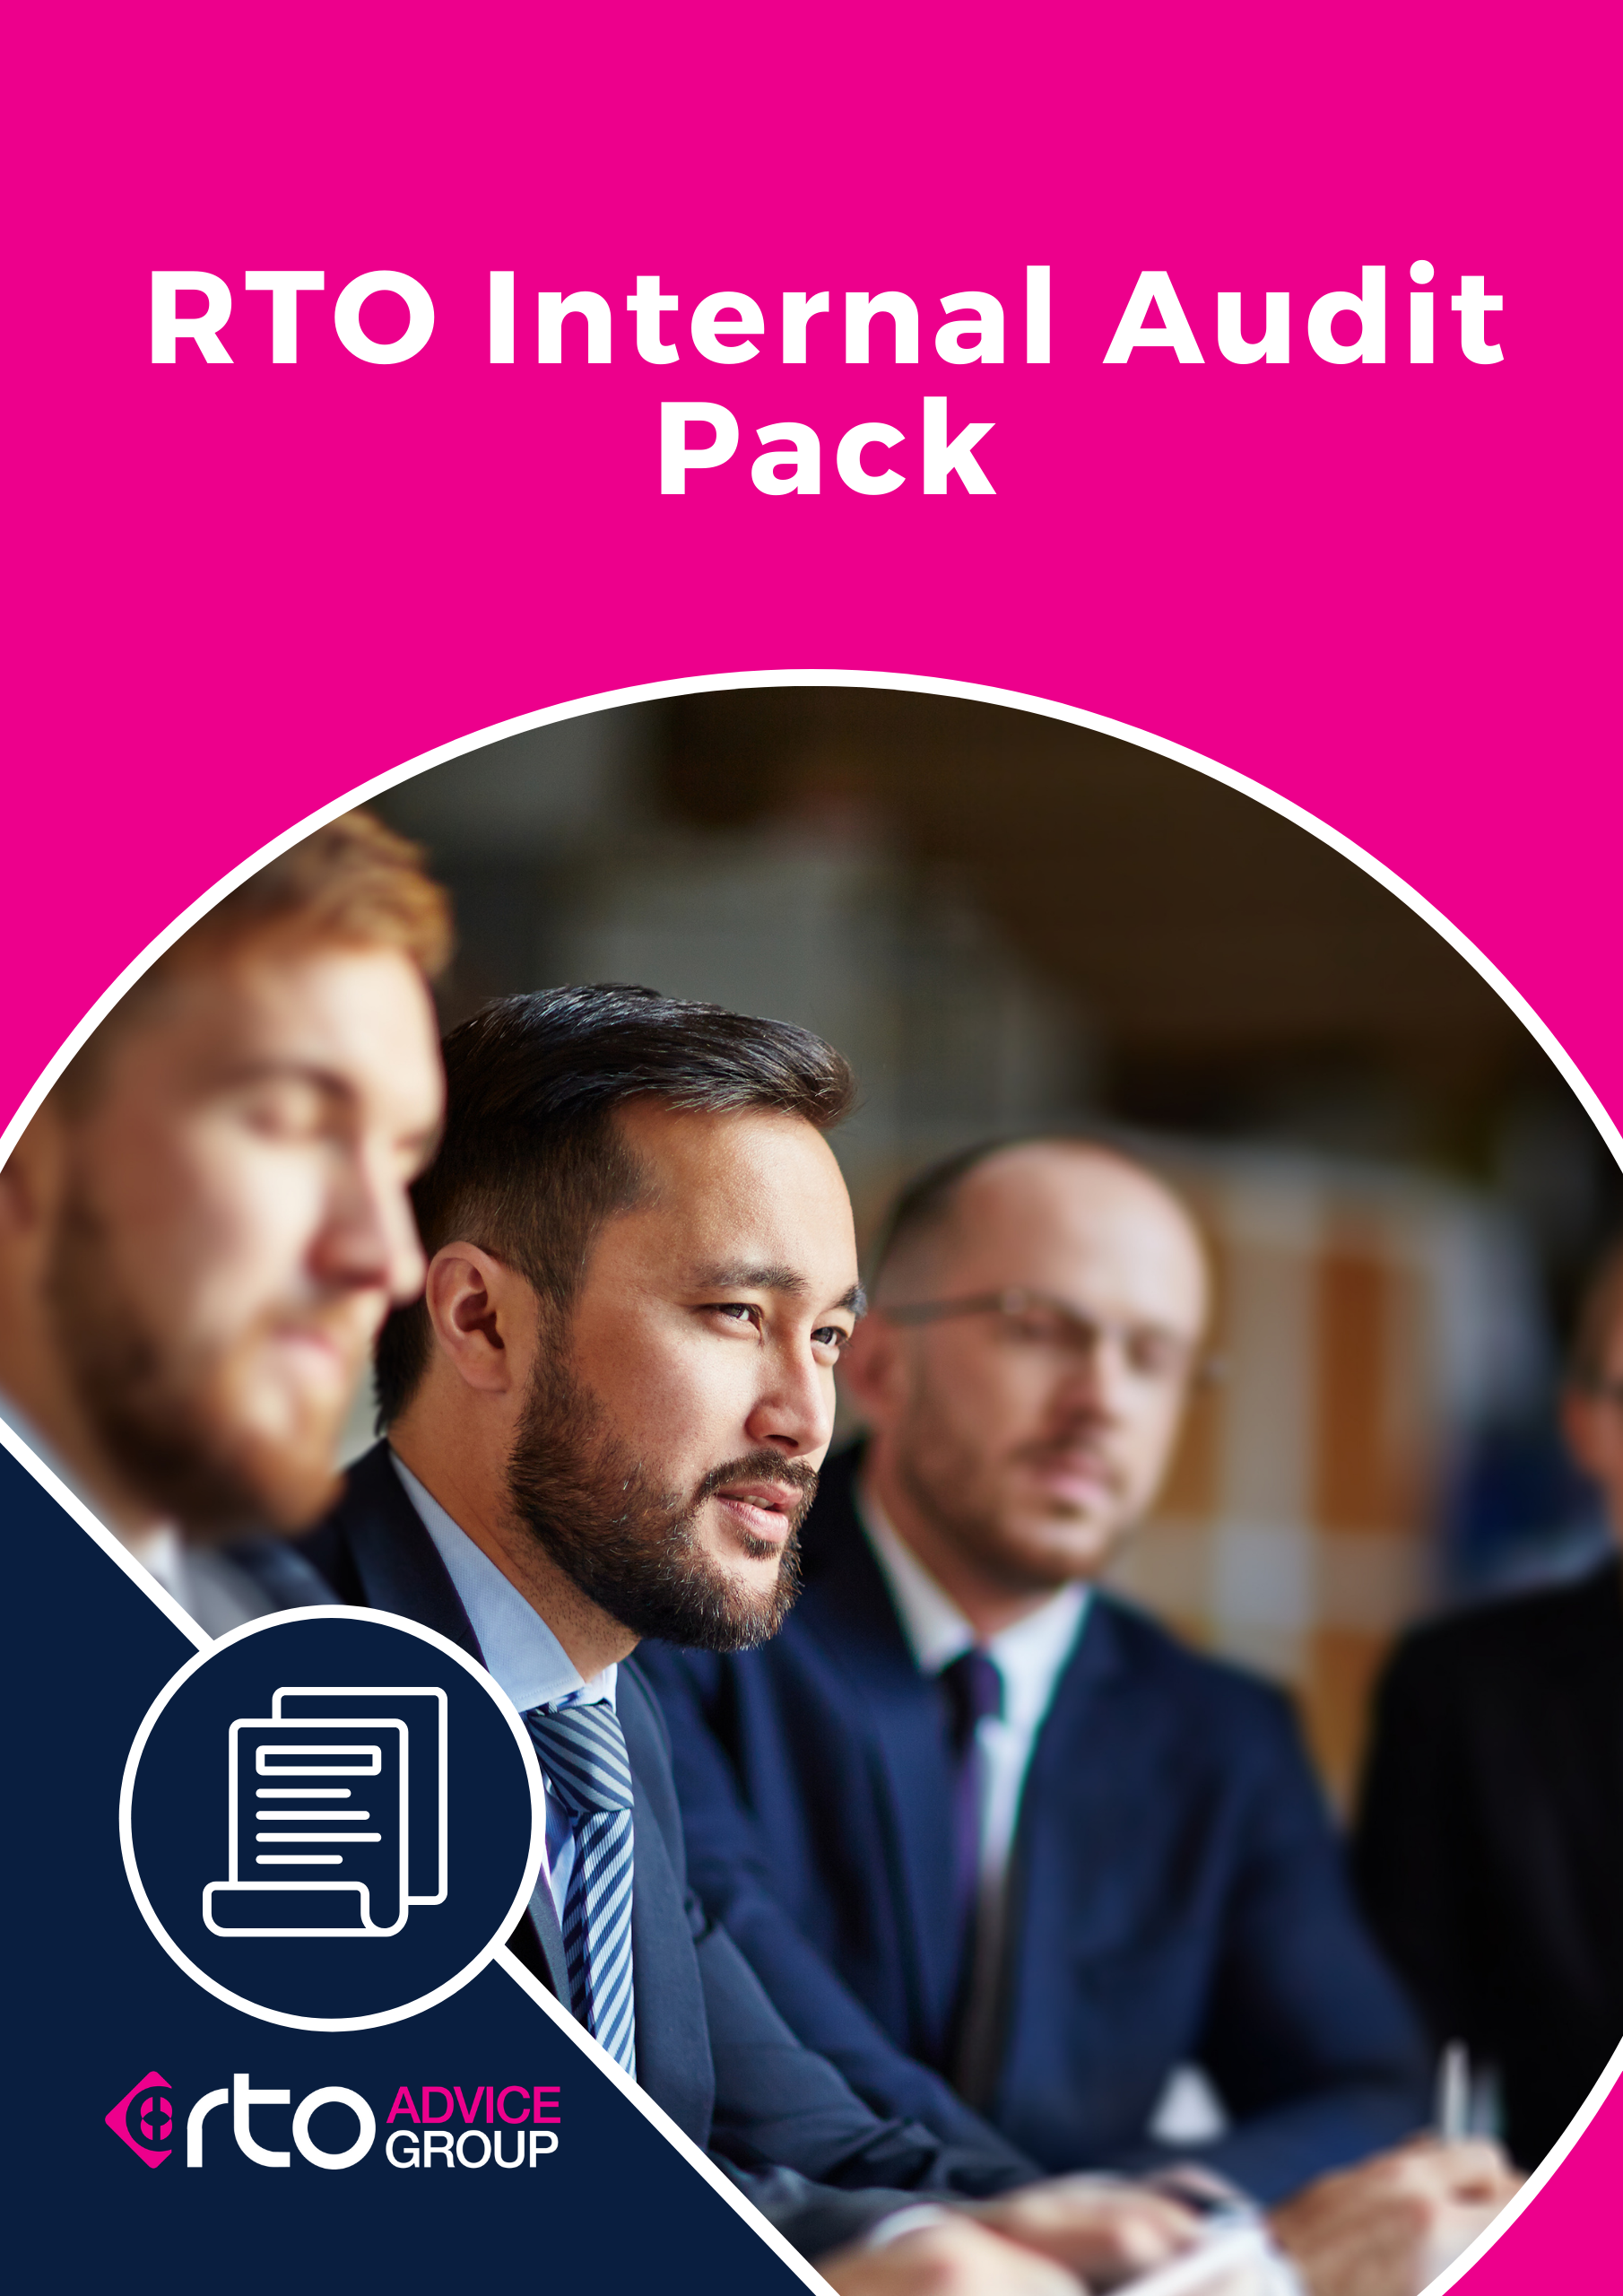 RTO Internal Audit Pack